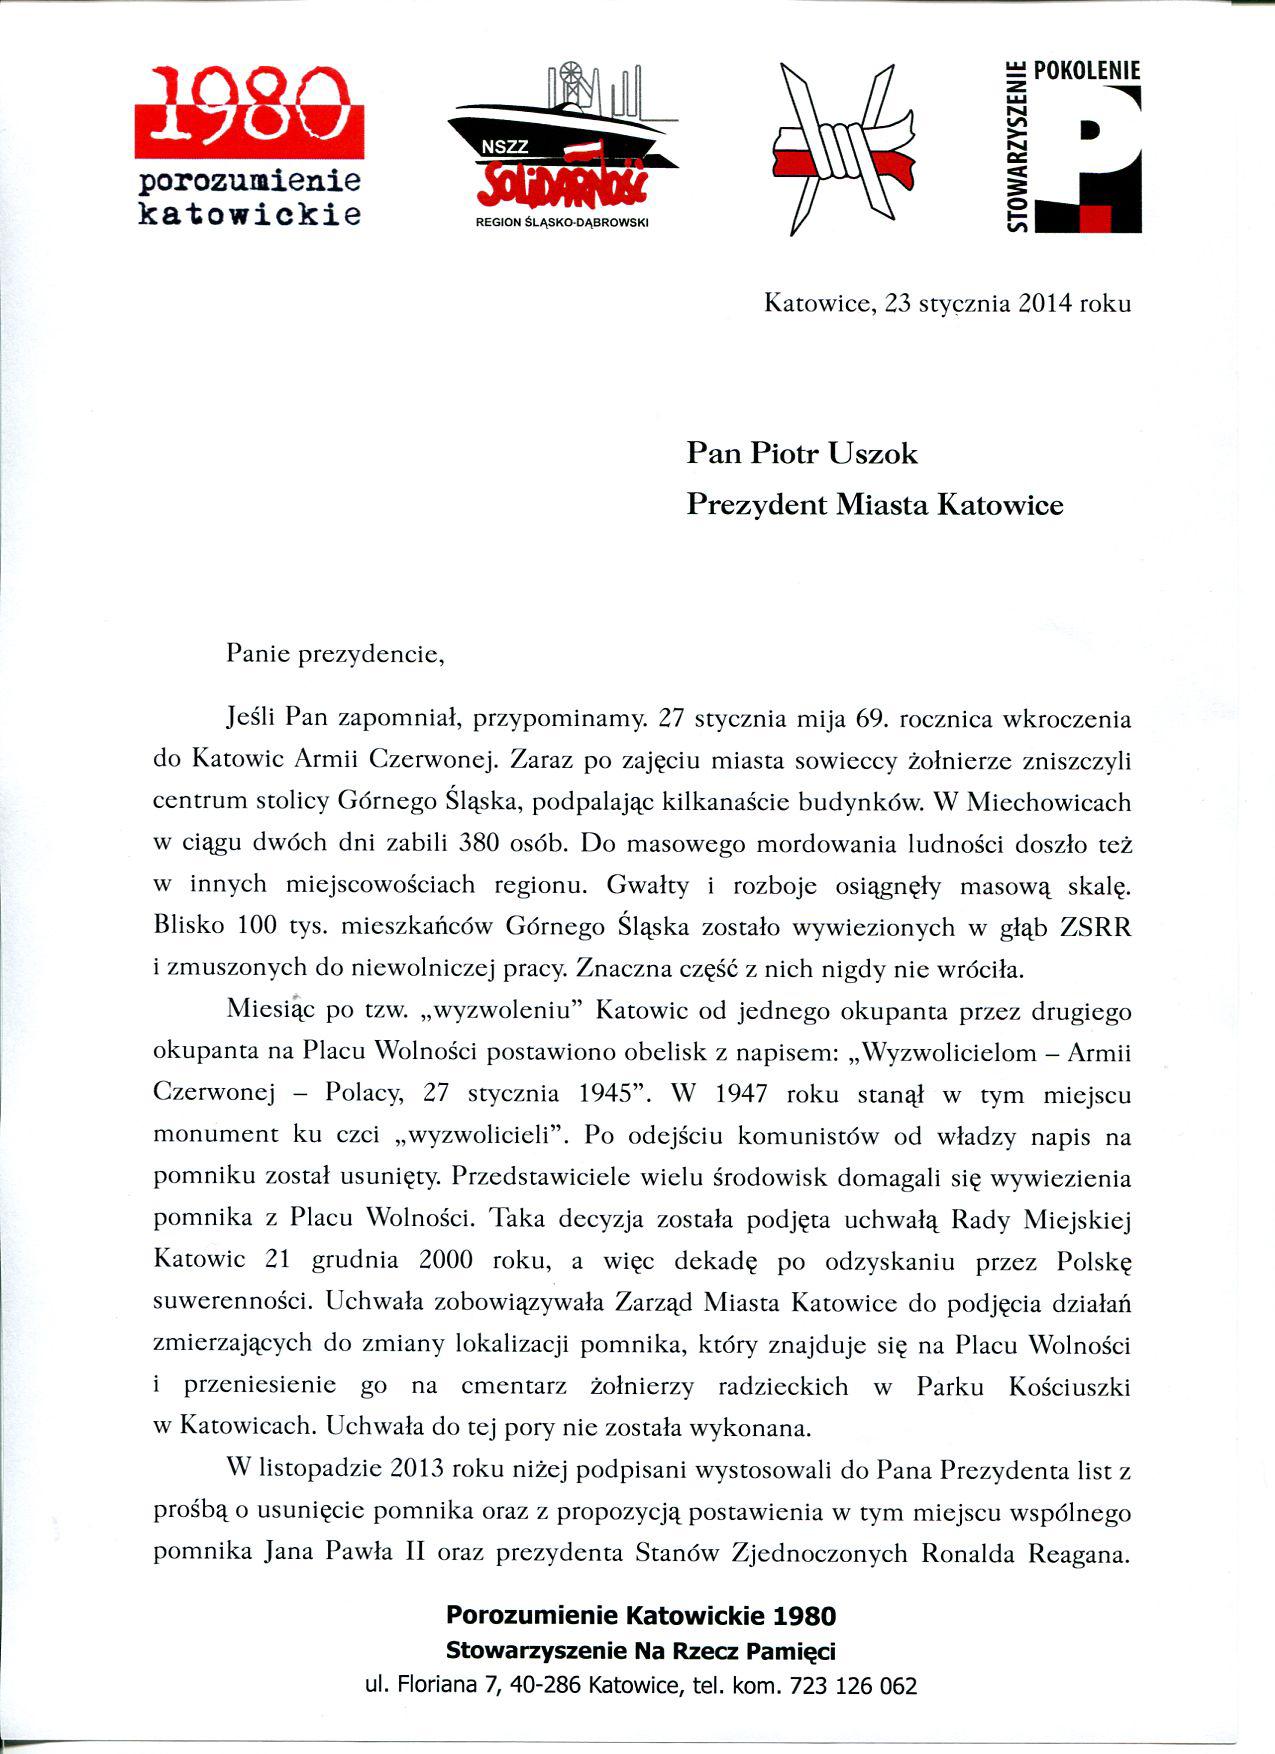 Pismo do Prezydenta1